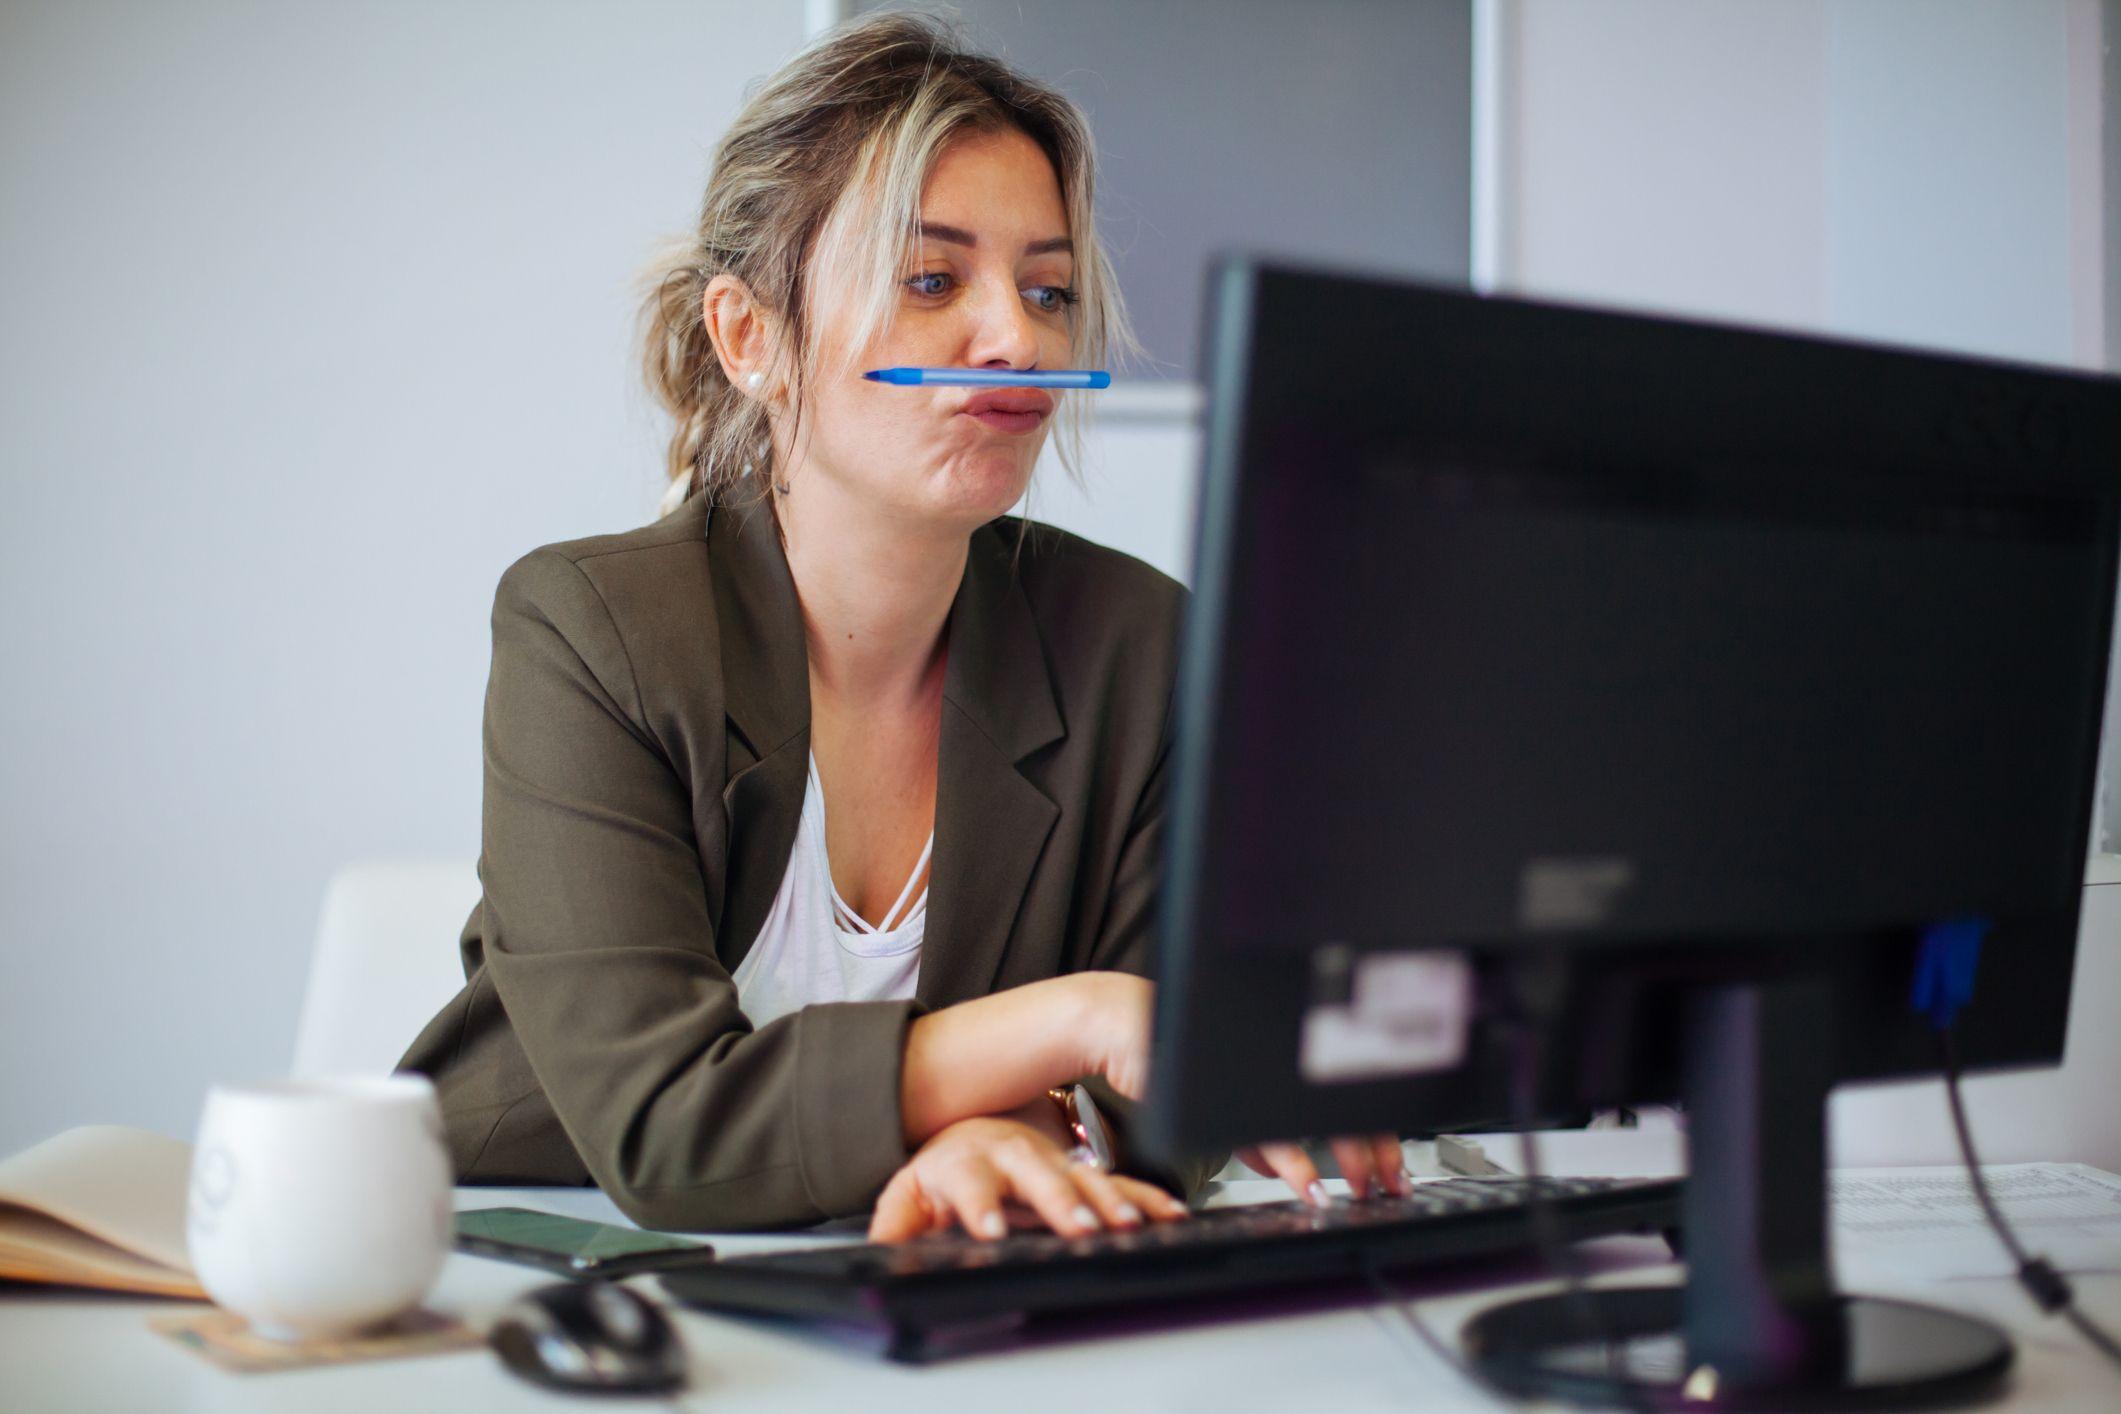 Woman procrastinating an important report